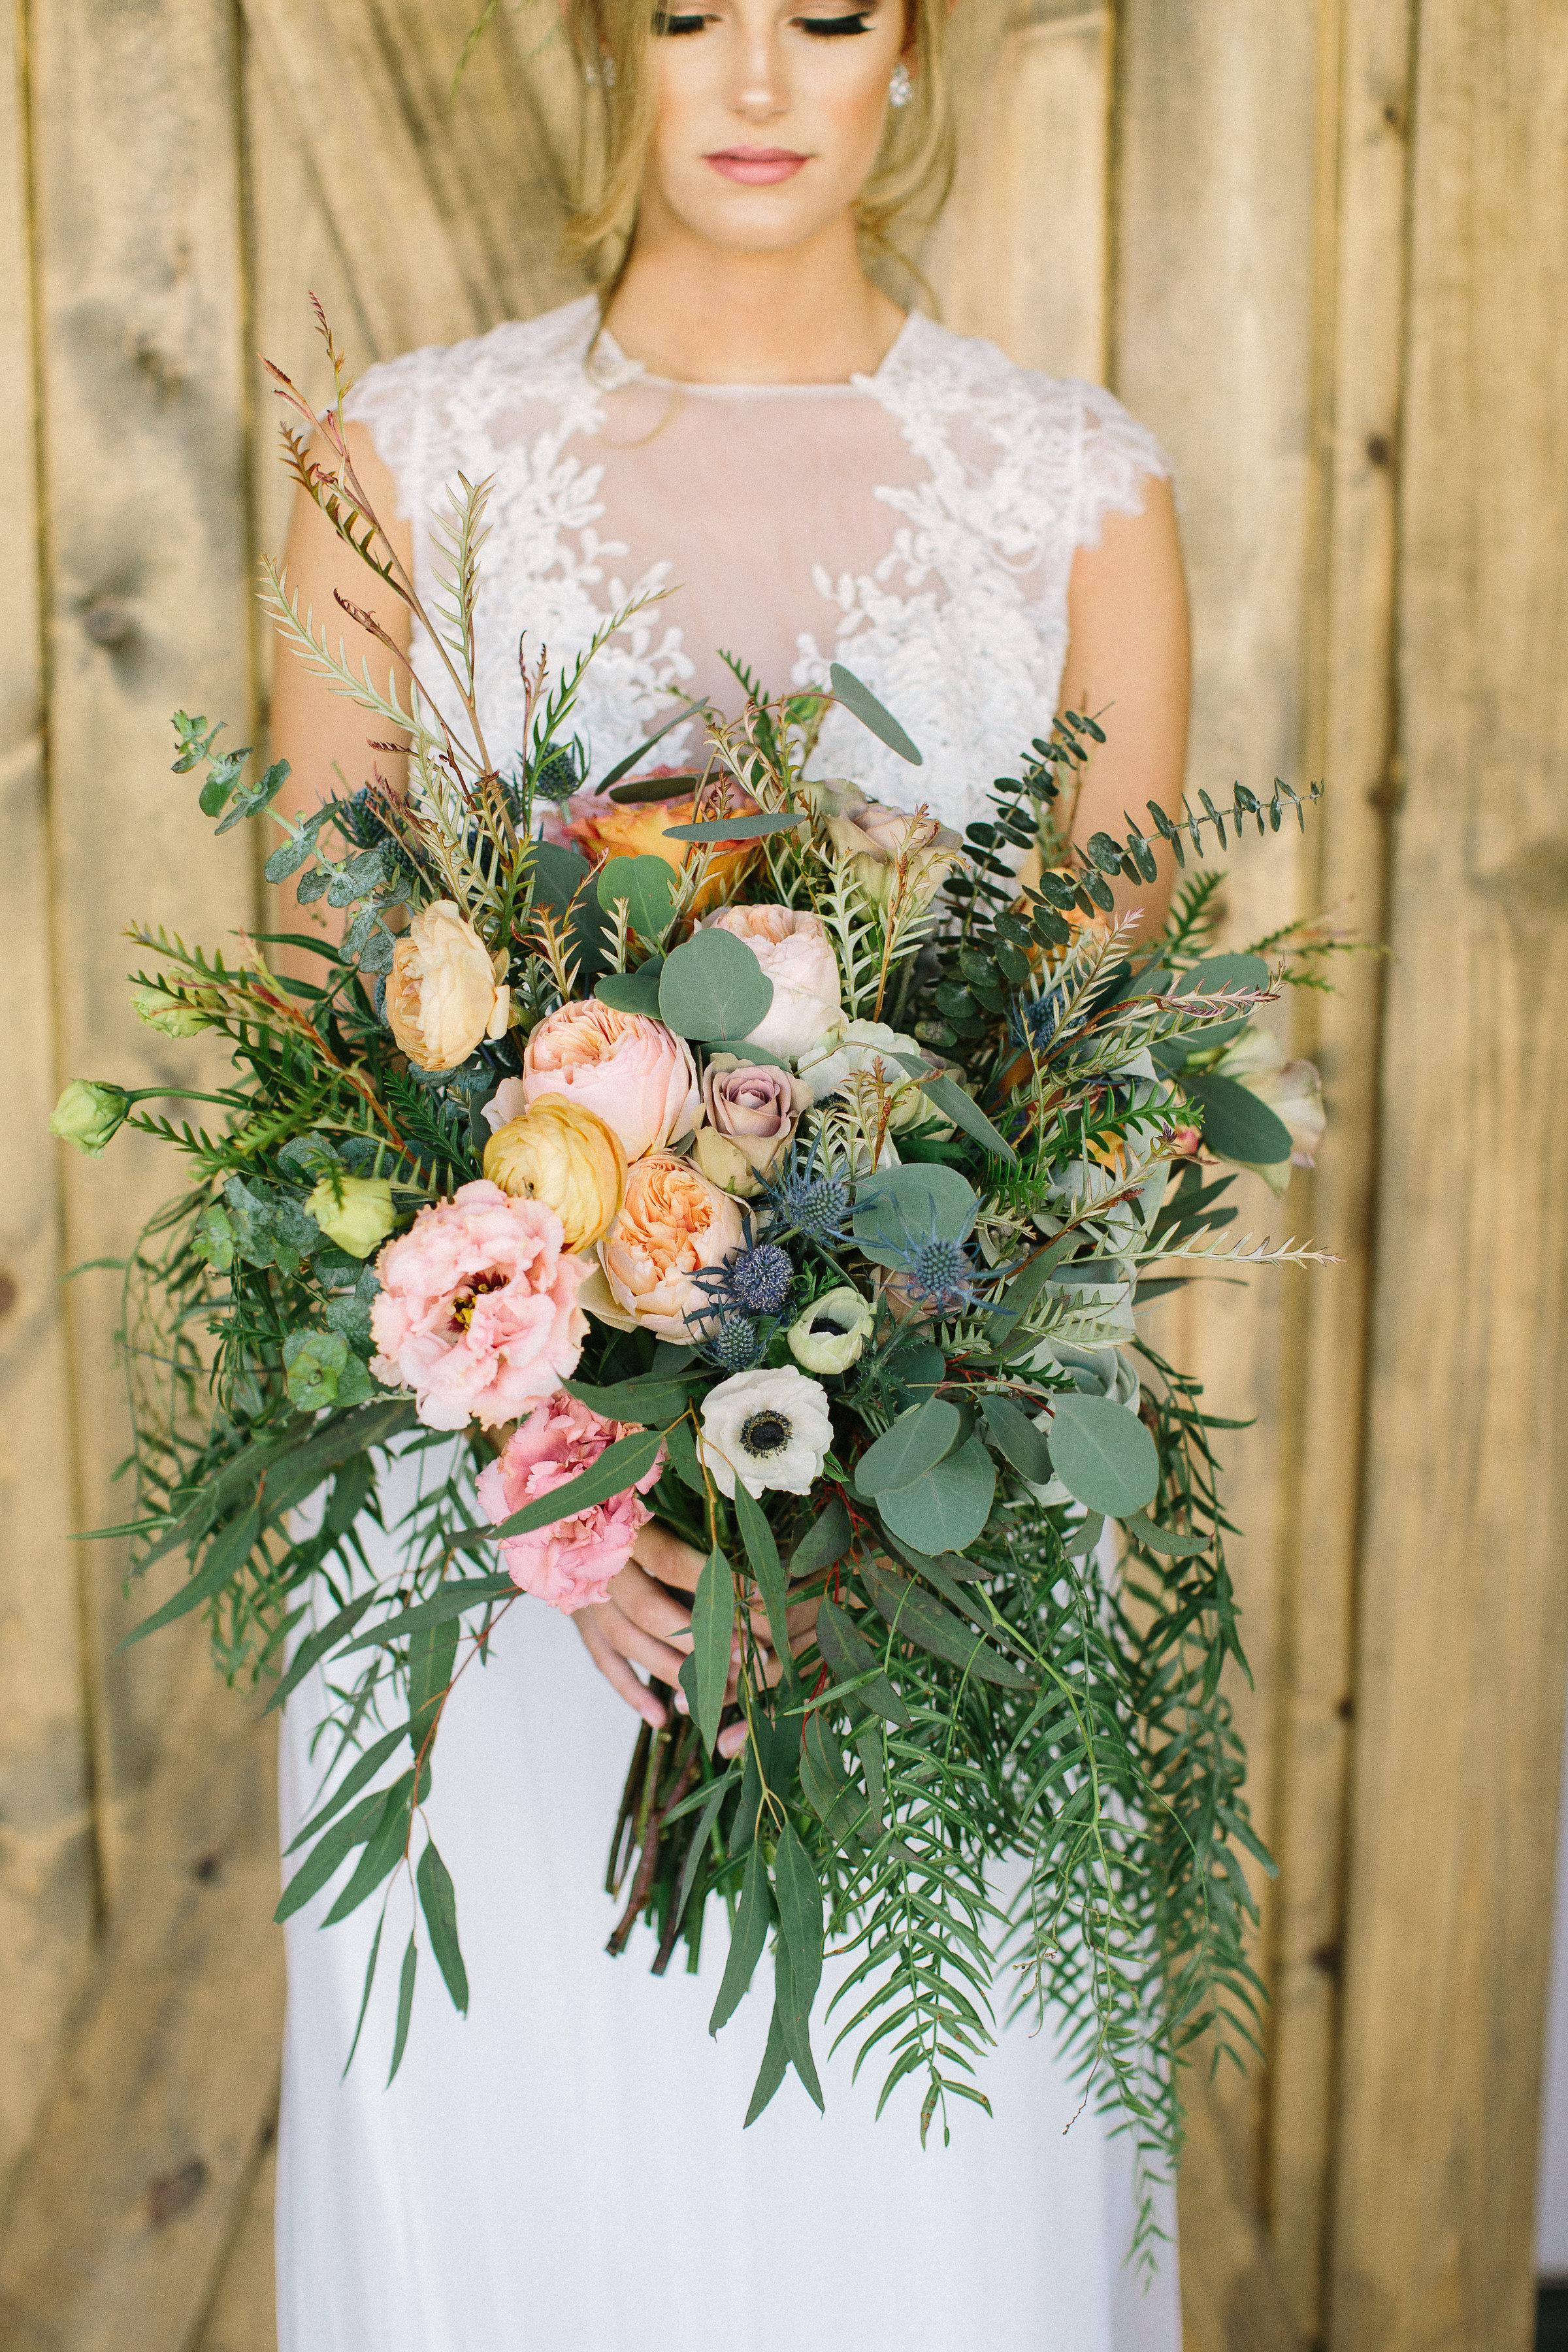 Ellen-Ashton-Photography-Peach-Creek-Ranch-Weddings-Wed-and-Prosper43